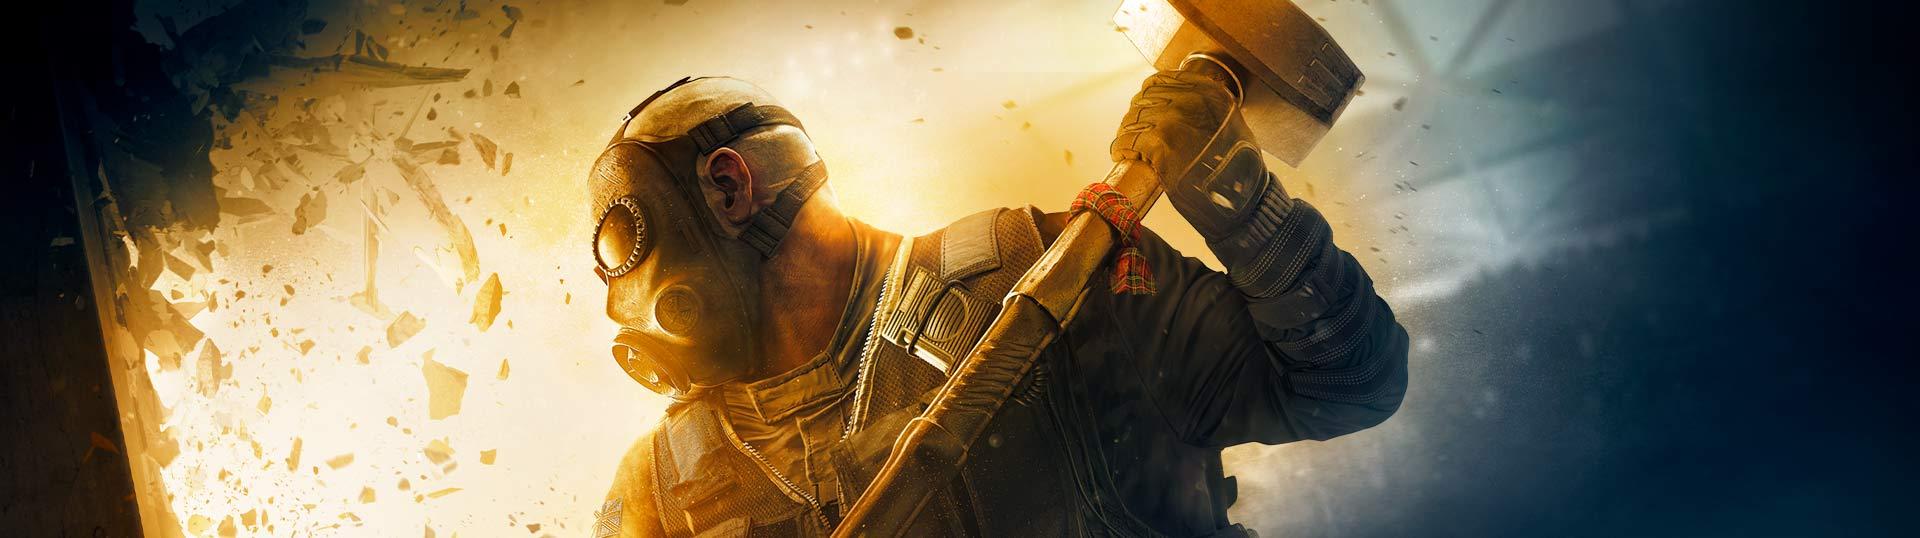 Buy Tom Clancy's Rainbow Six Siege PC/PS4/Xbox · Ubisoft Store - Download Buy Tom Clancy's Rainbow Six Siege PC/PS4/Xbox · Ubisoft Store for FREE - Free Cheats for Games